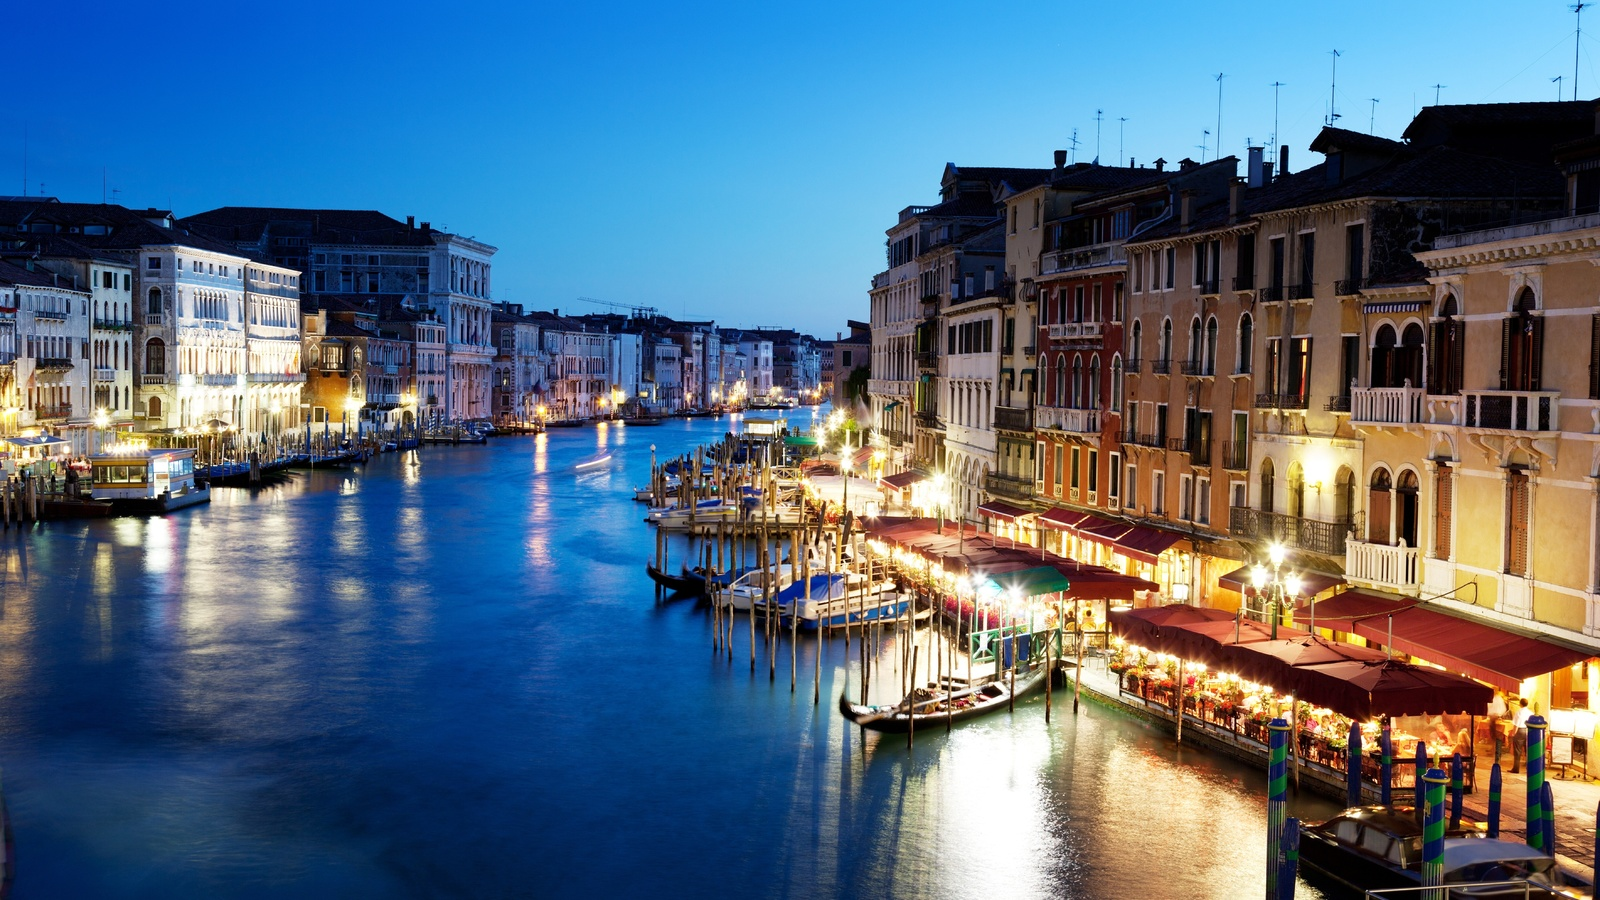 Гранд-канал, canal grande, венеция, venice, italy, вечер, италия